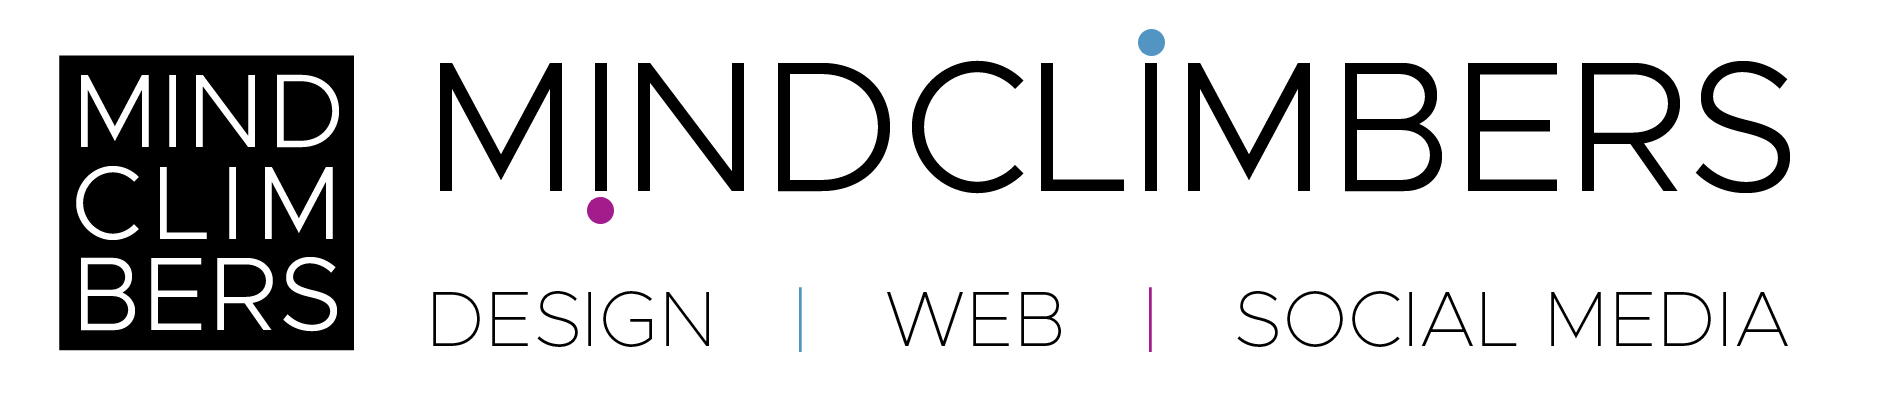 Logo Mindclimbers - Design Web Social Media